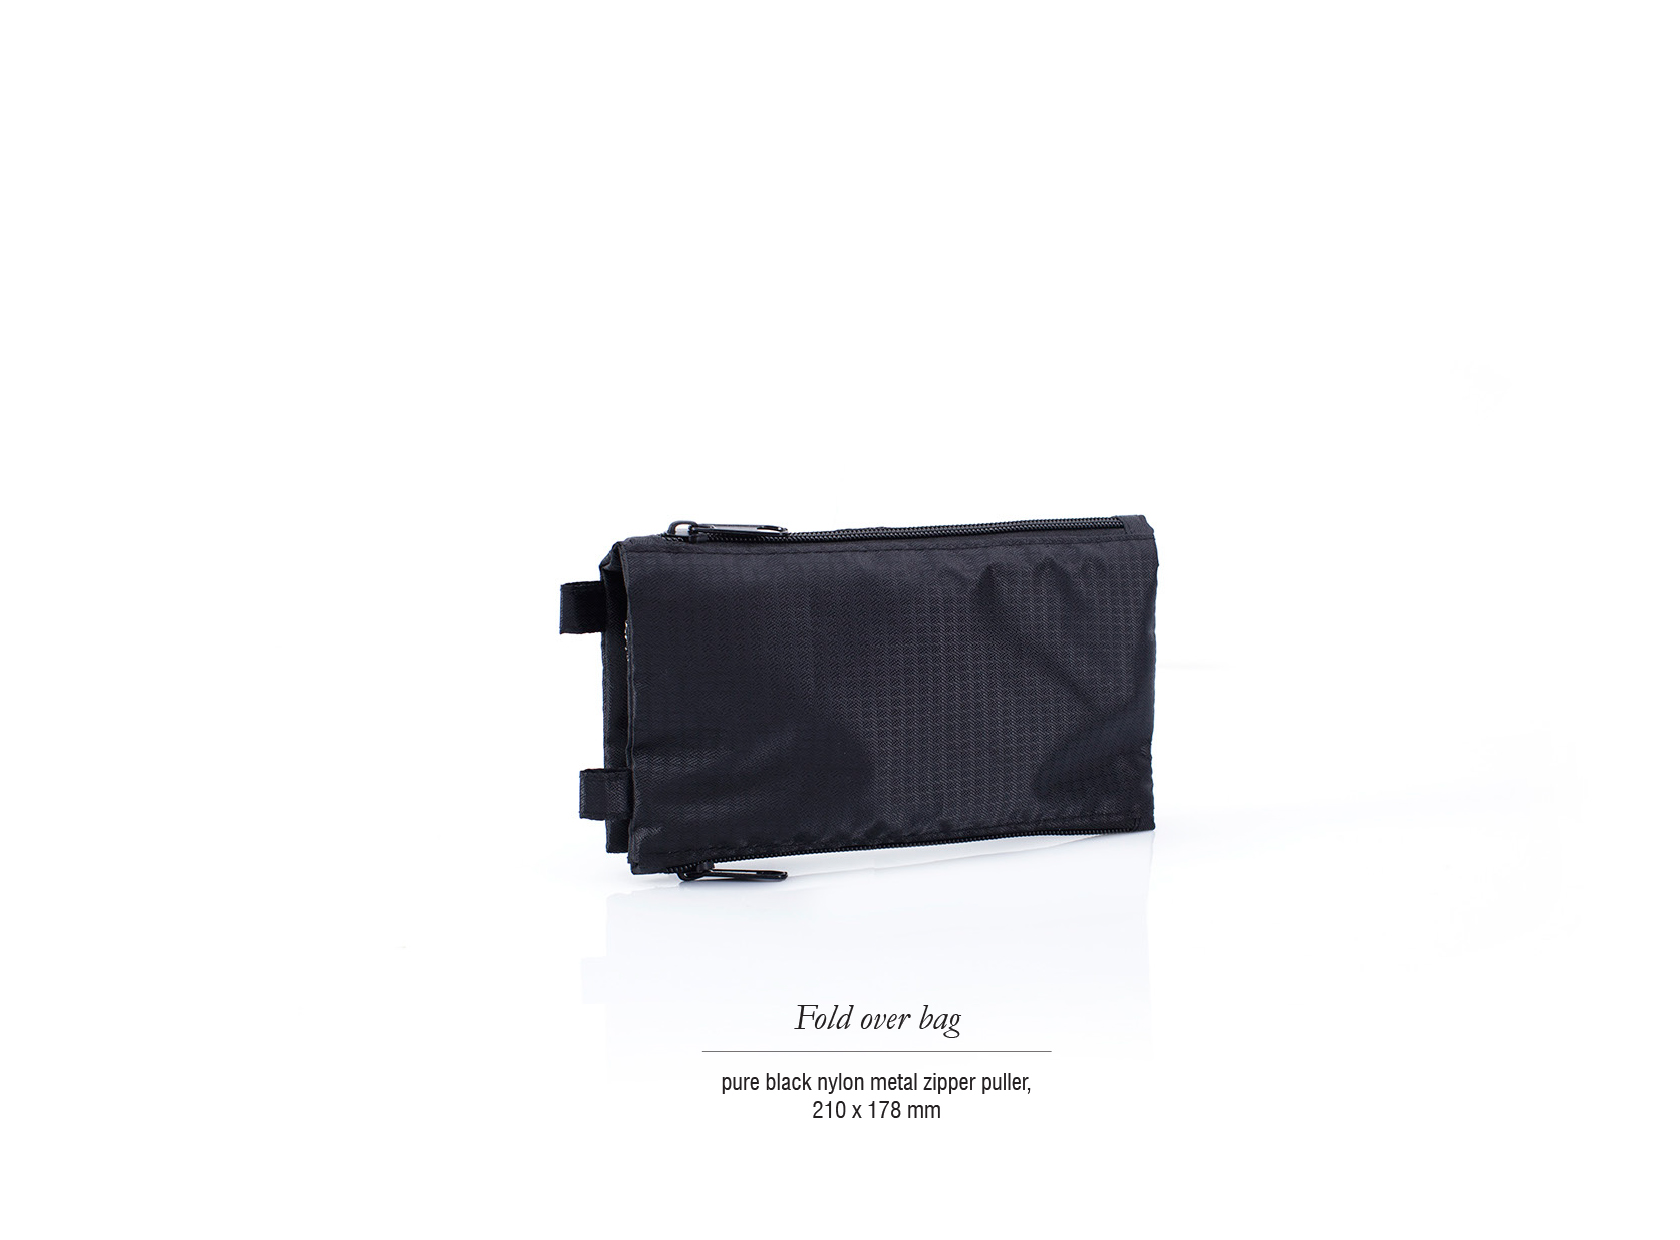 Amenity bags catalogue 2016_SHcollection_V6 89.jpg